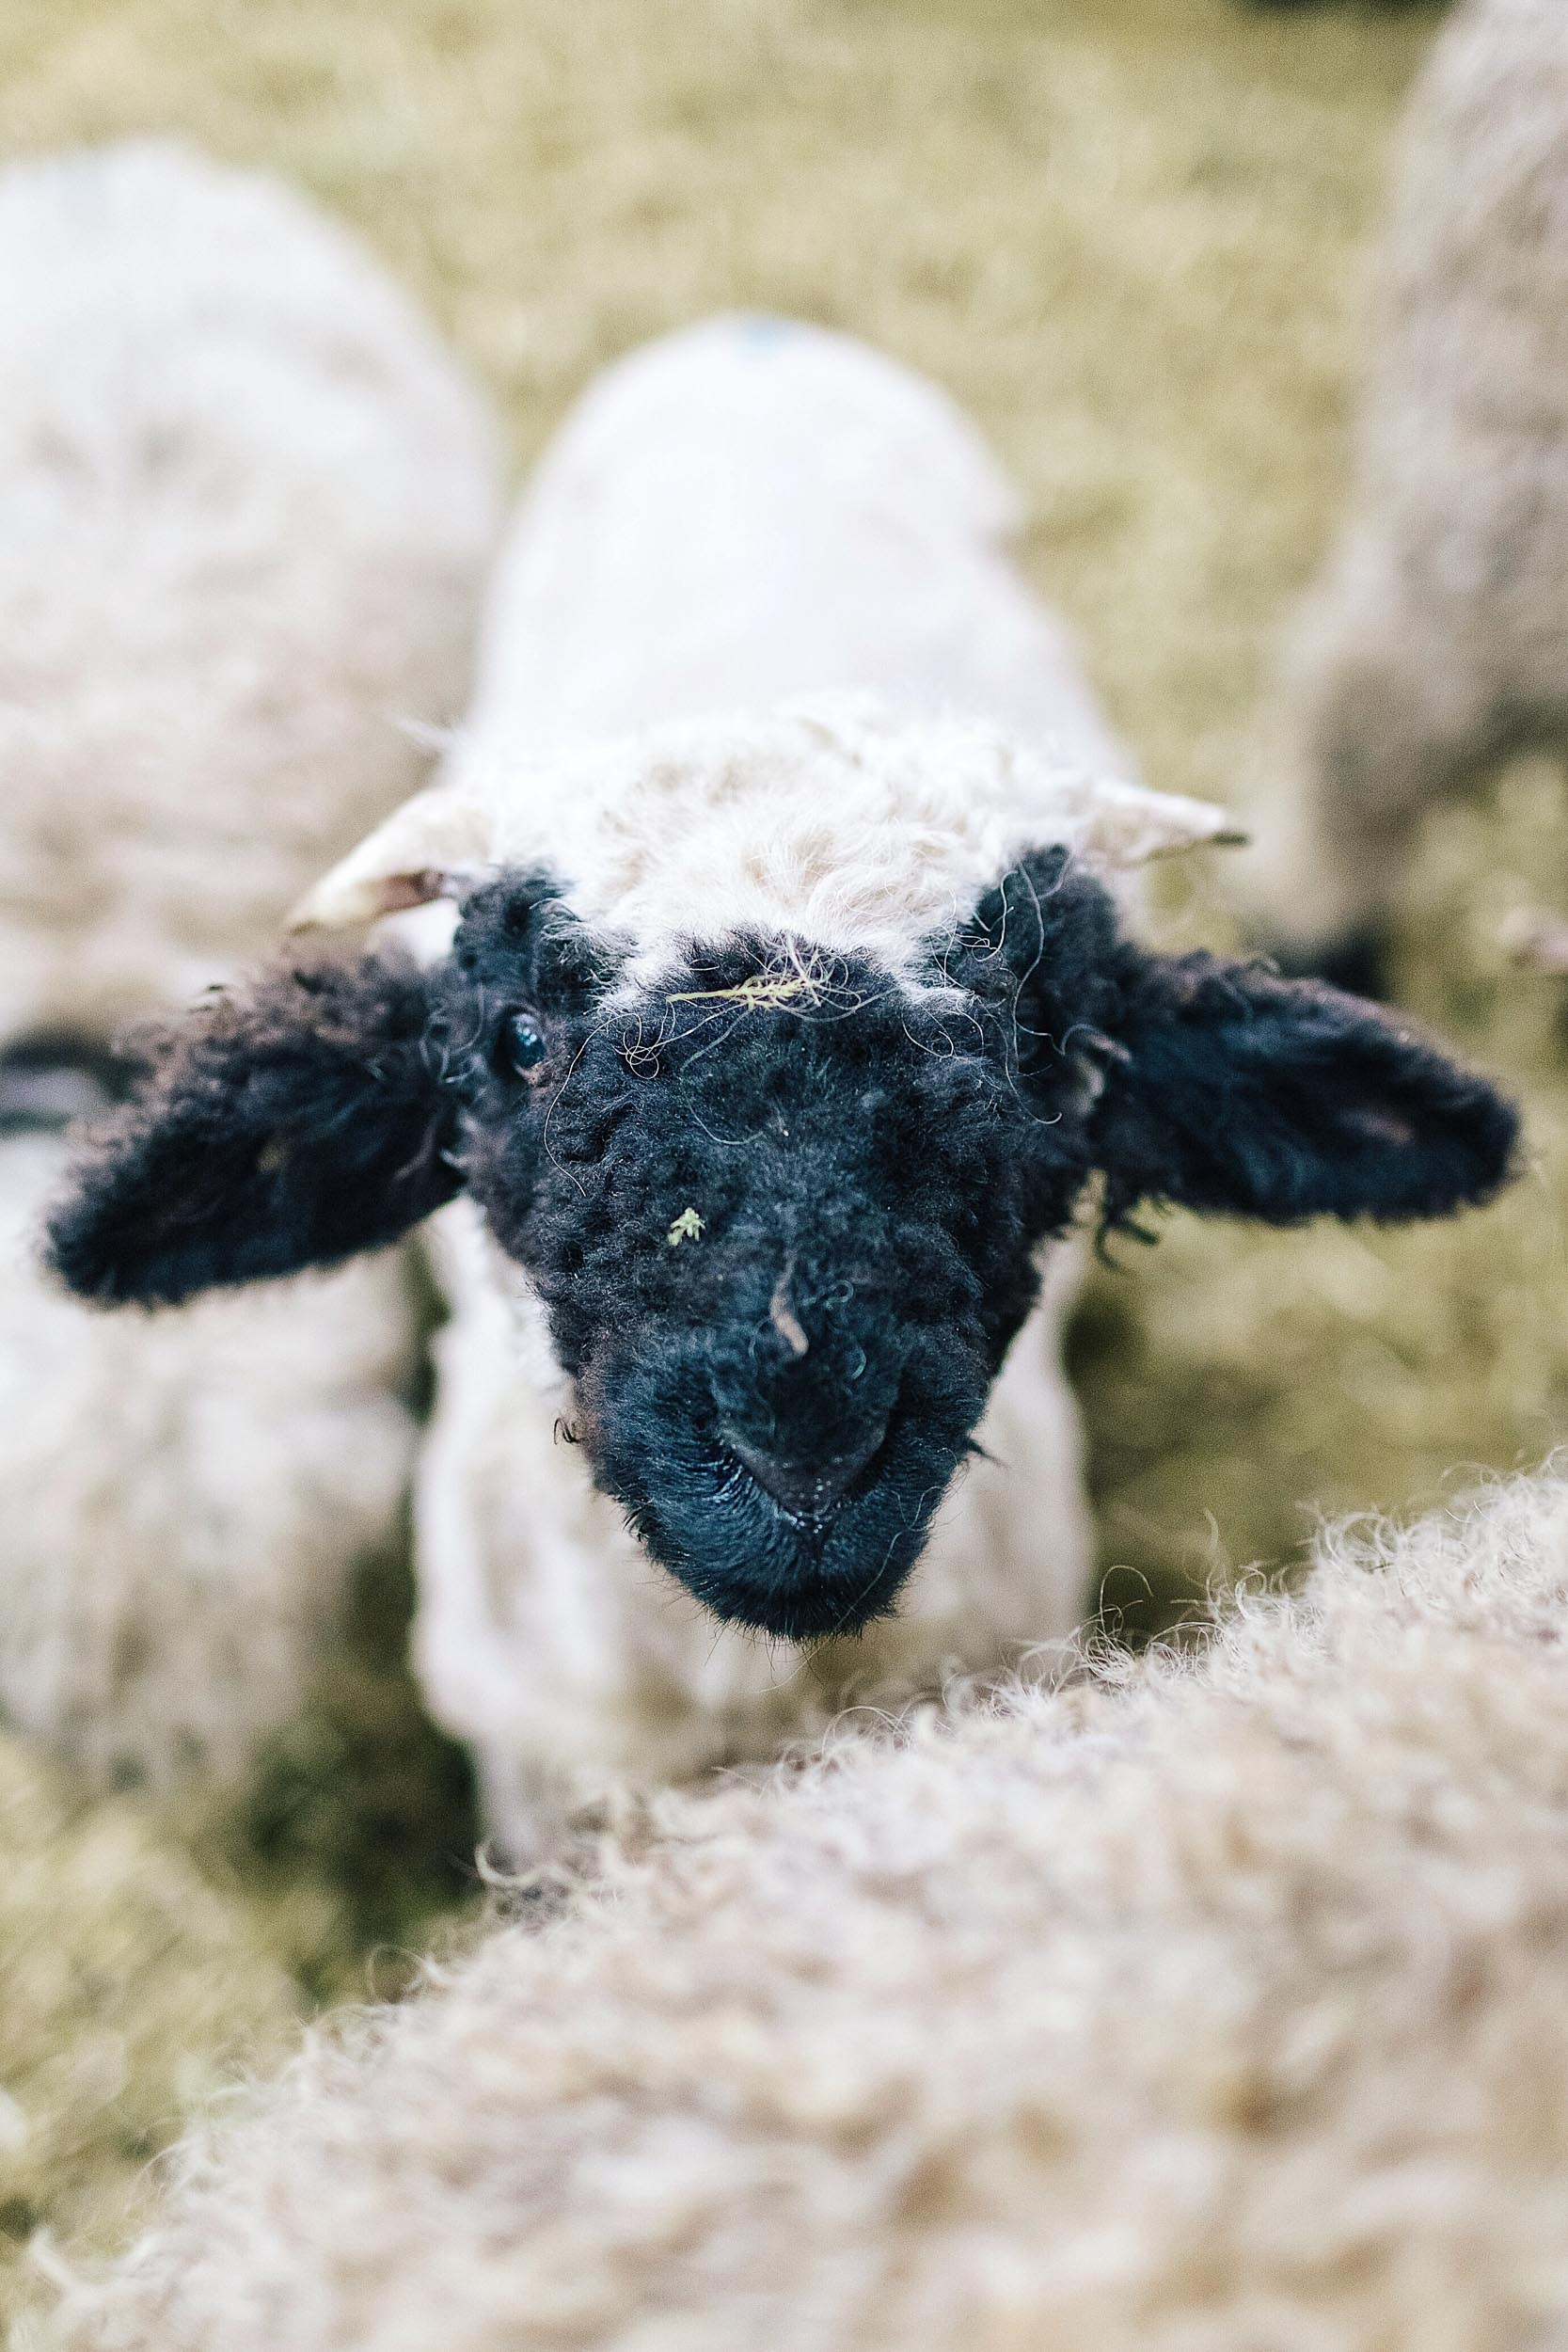 A baby black nose sheep in Switzerland